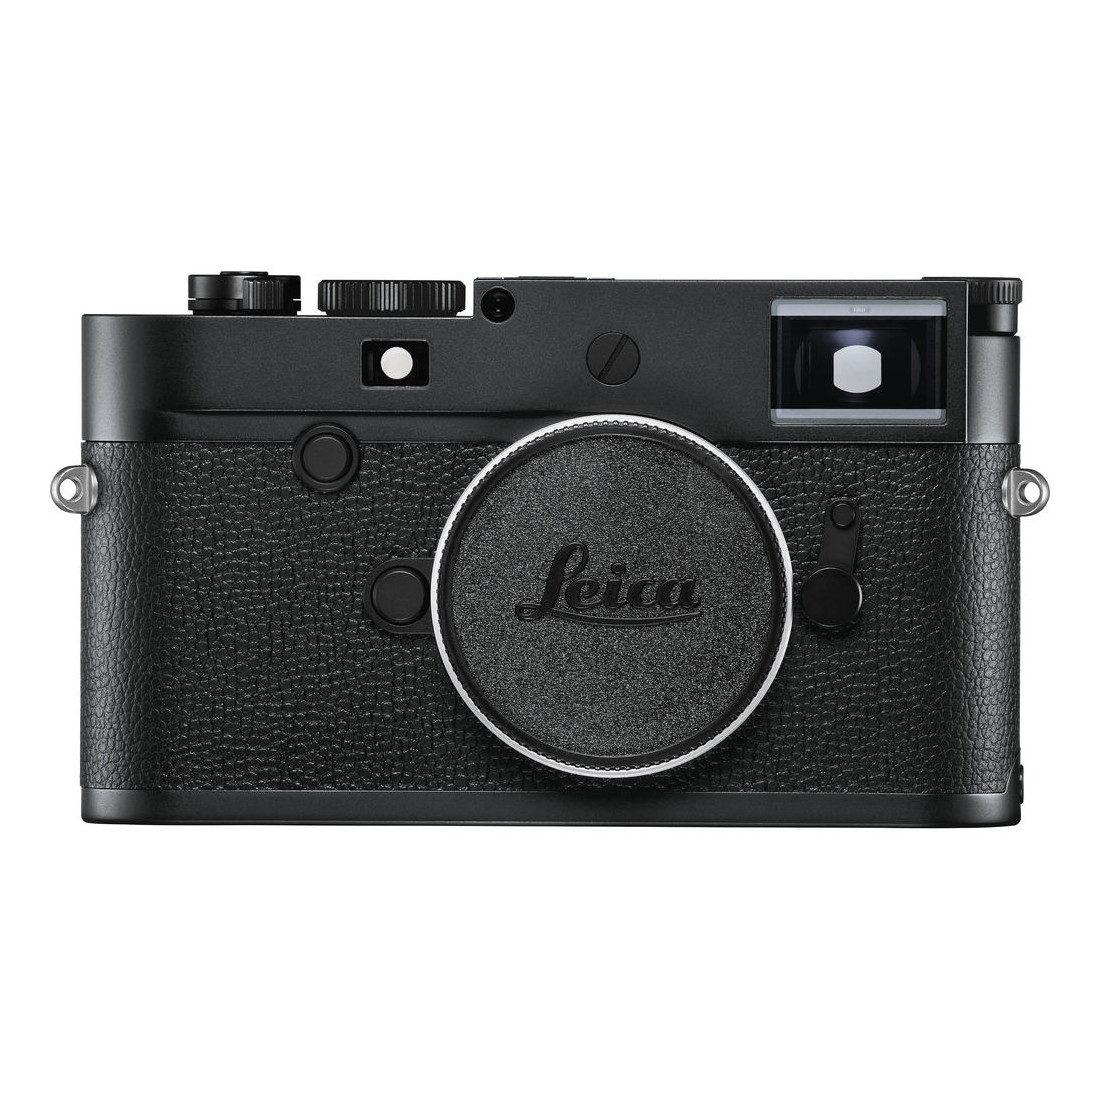 Leica M10 Monochrom systeemcamera Body Zwart